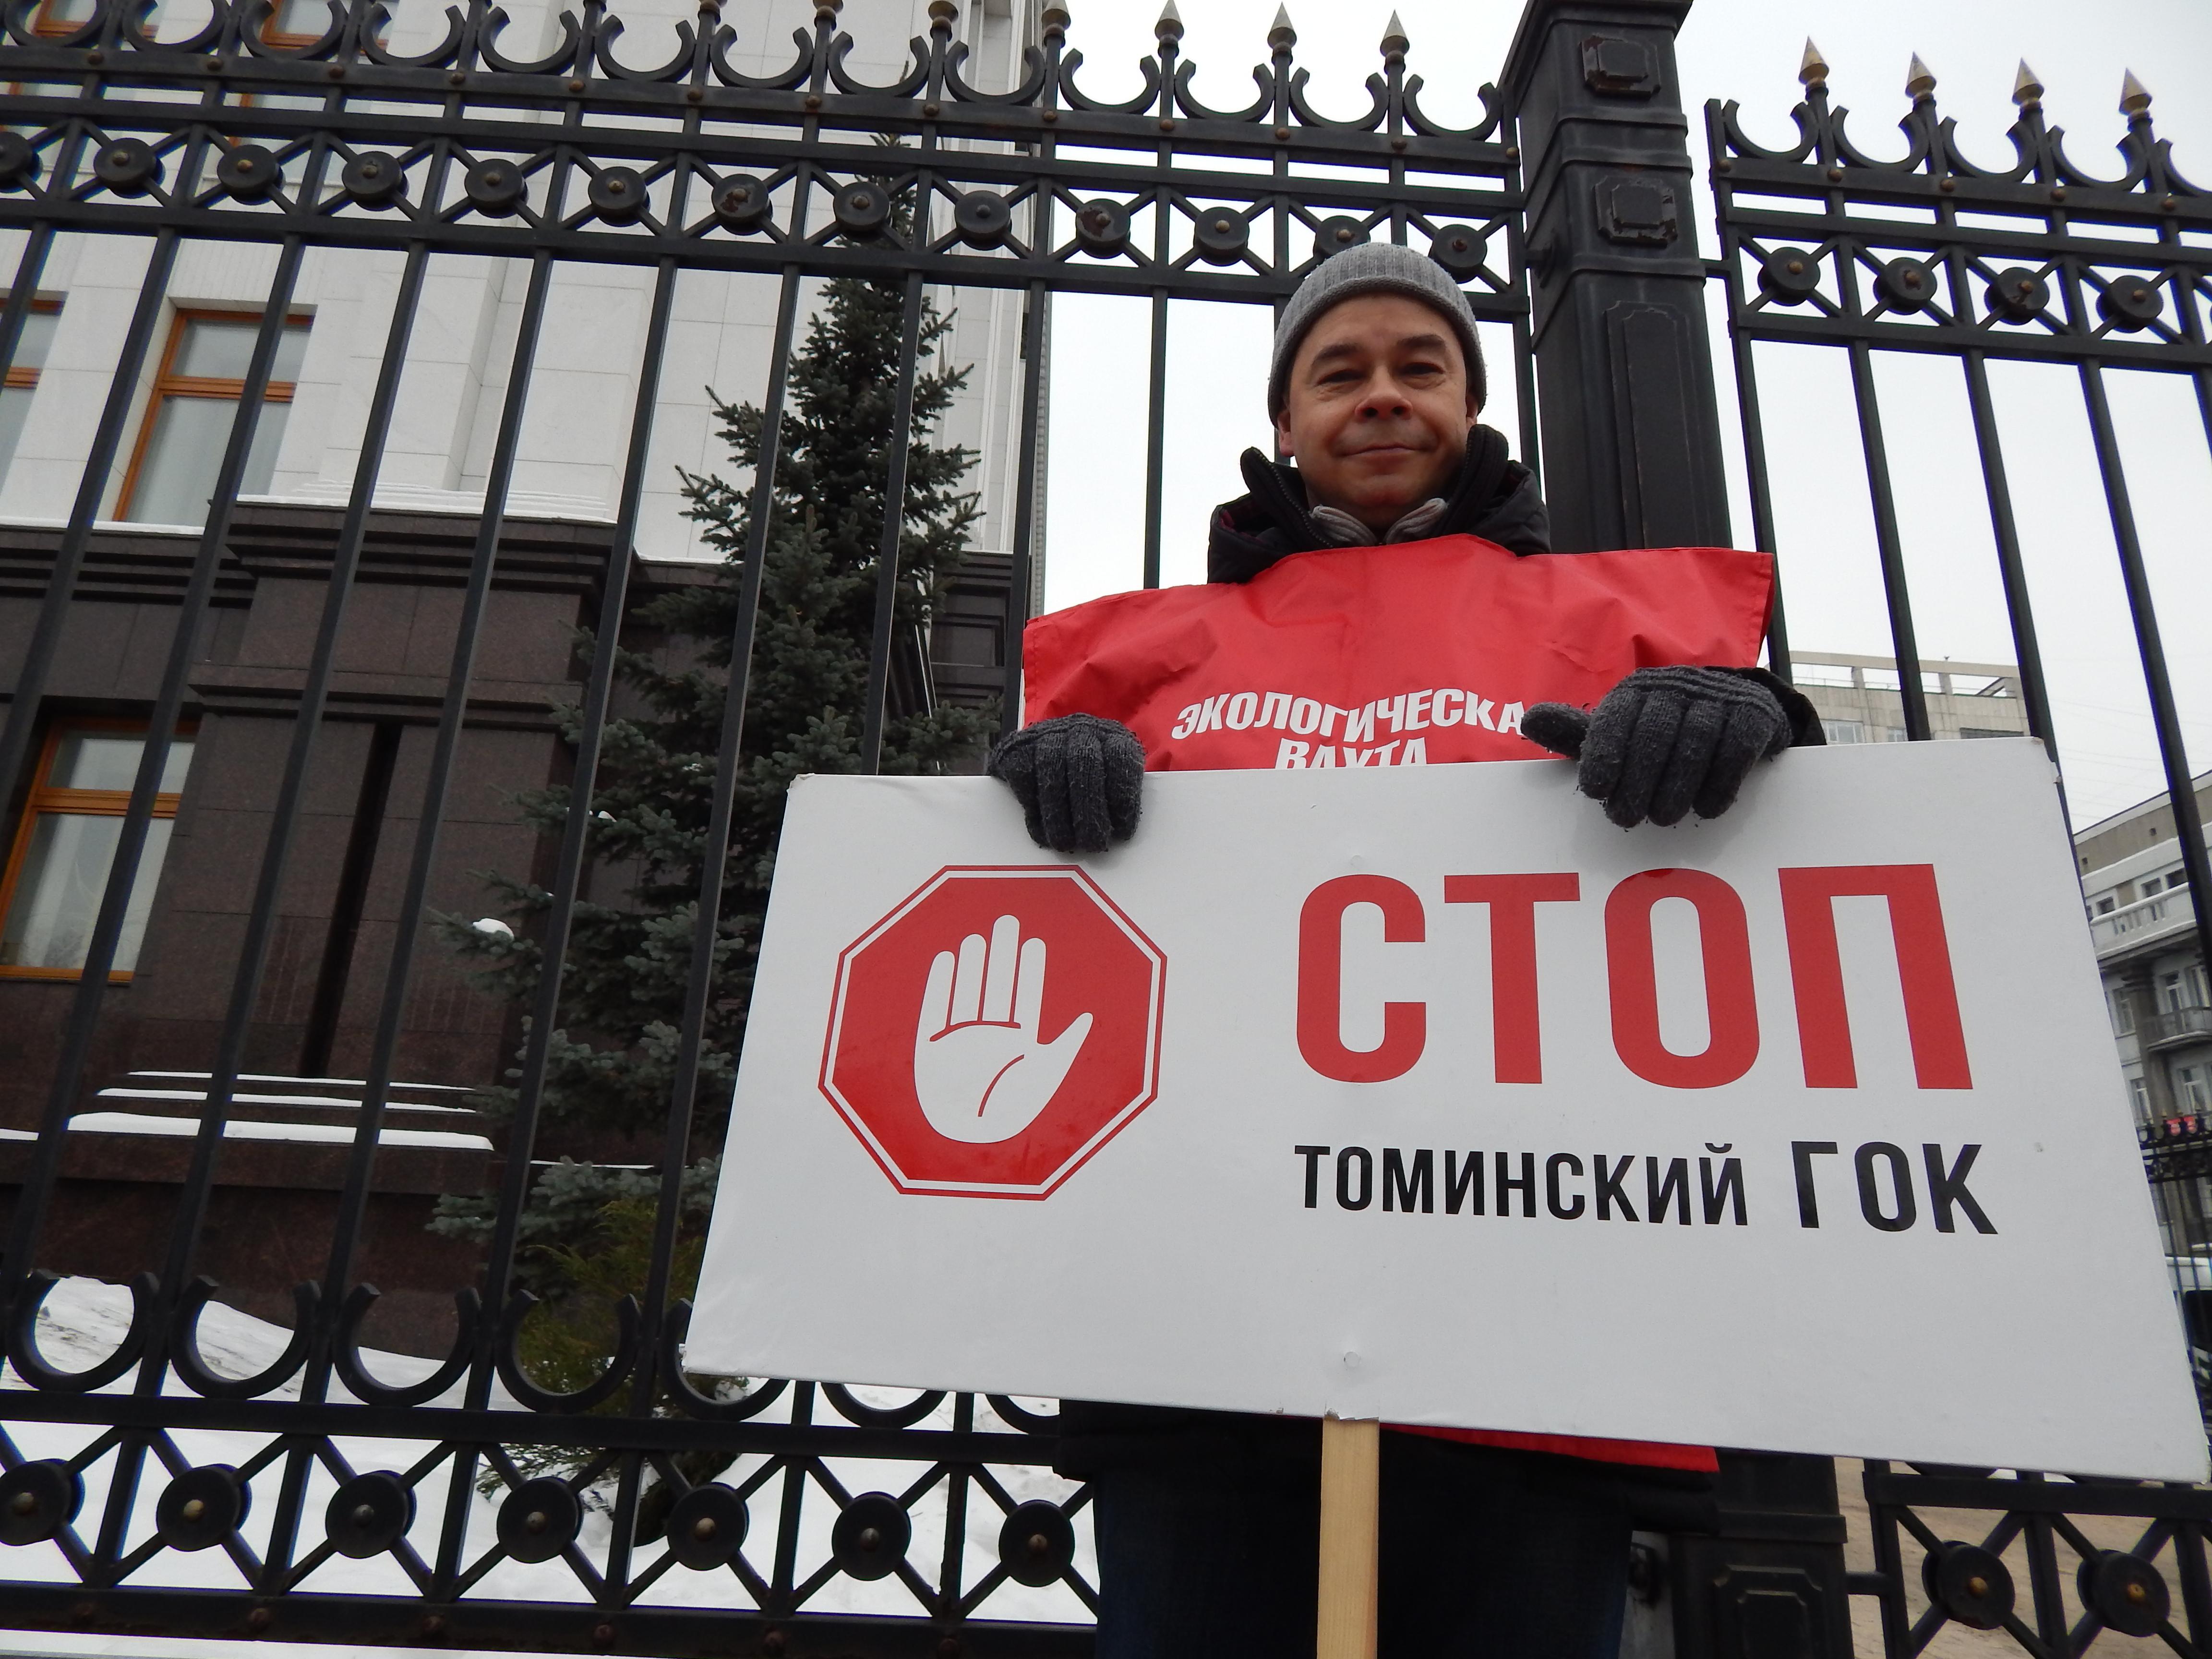 Стоп Томинский ГОК